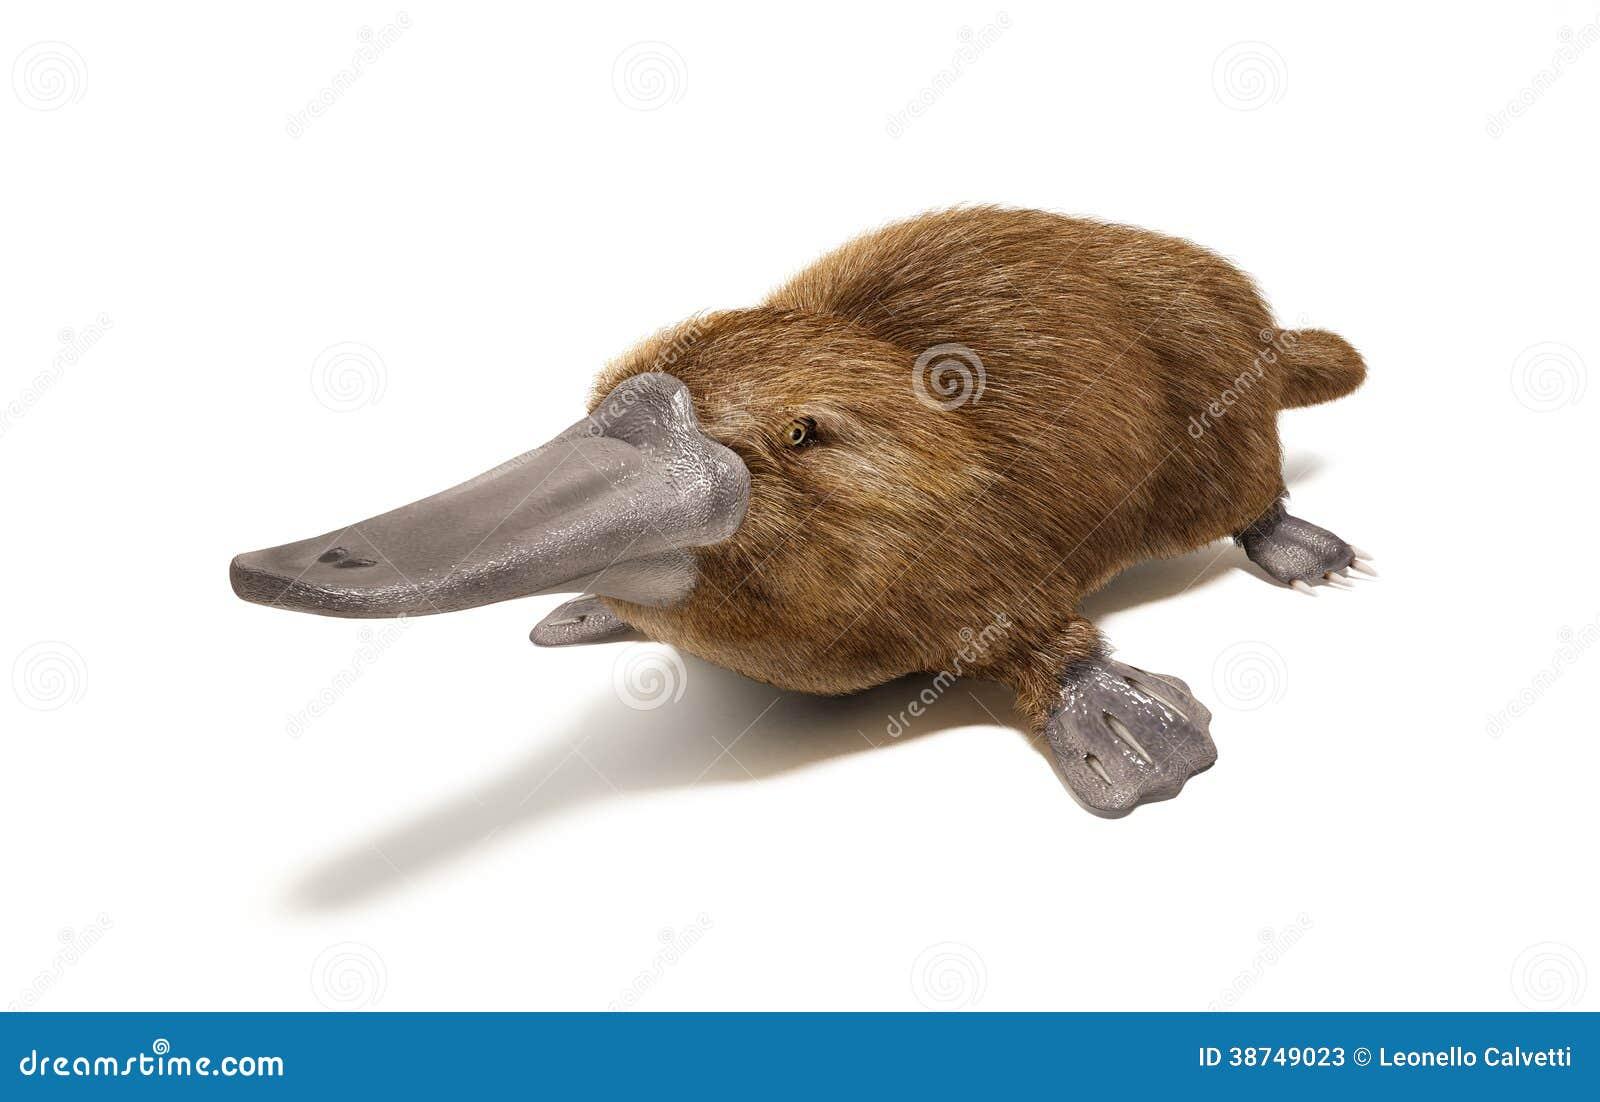 Schnabeltier Ente-berechnetes Tier. Stock Abbildung - Illustration ...